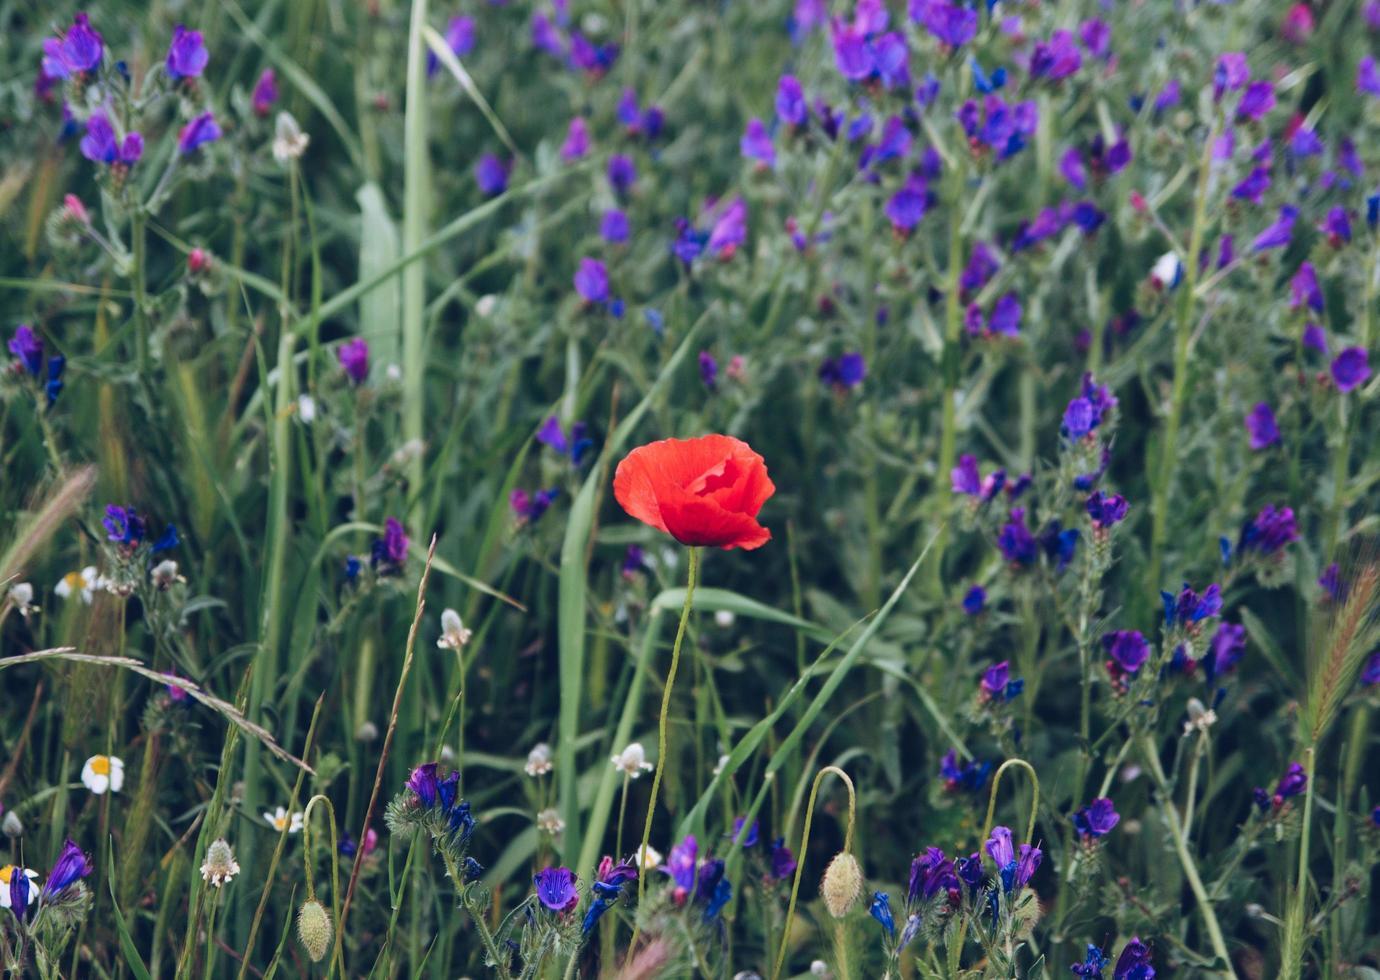 planta de flor roja foto